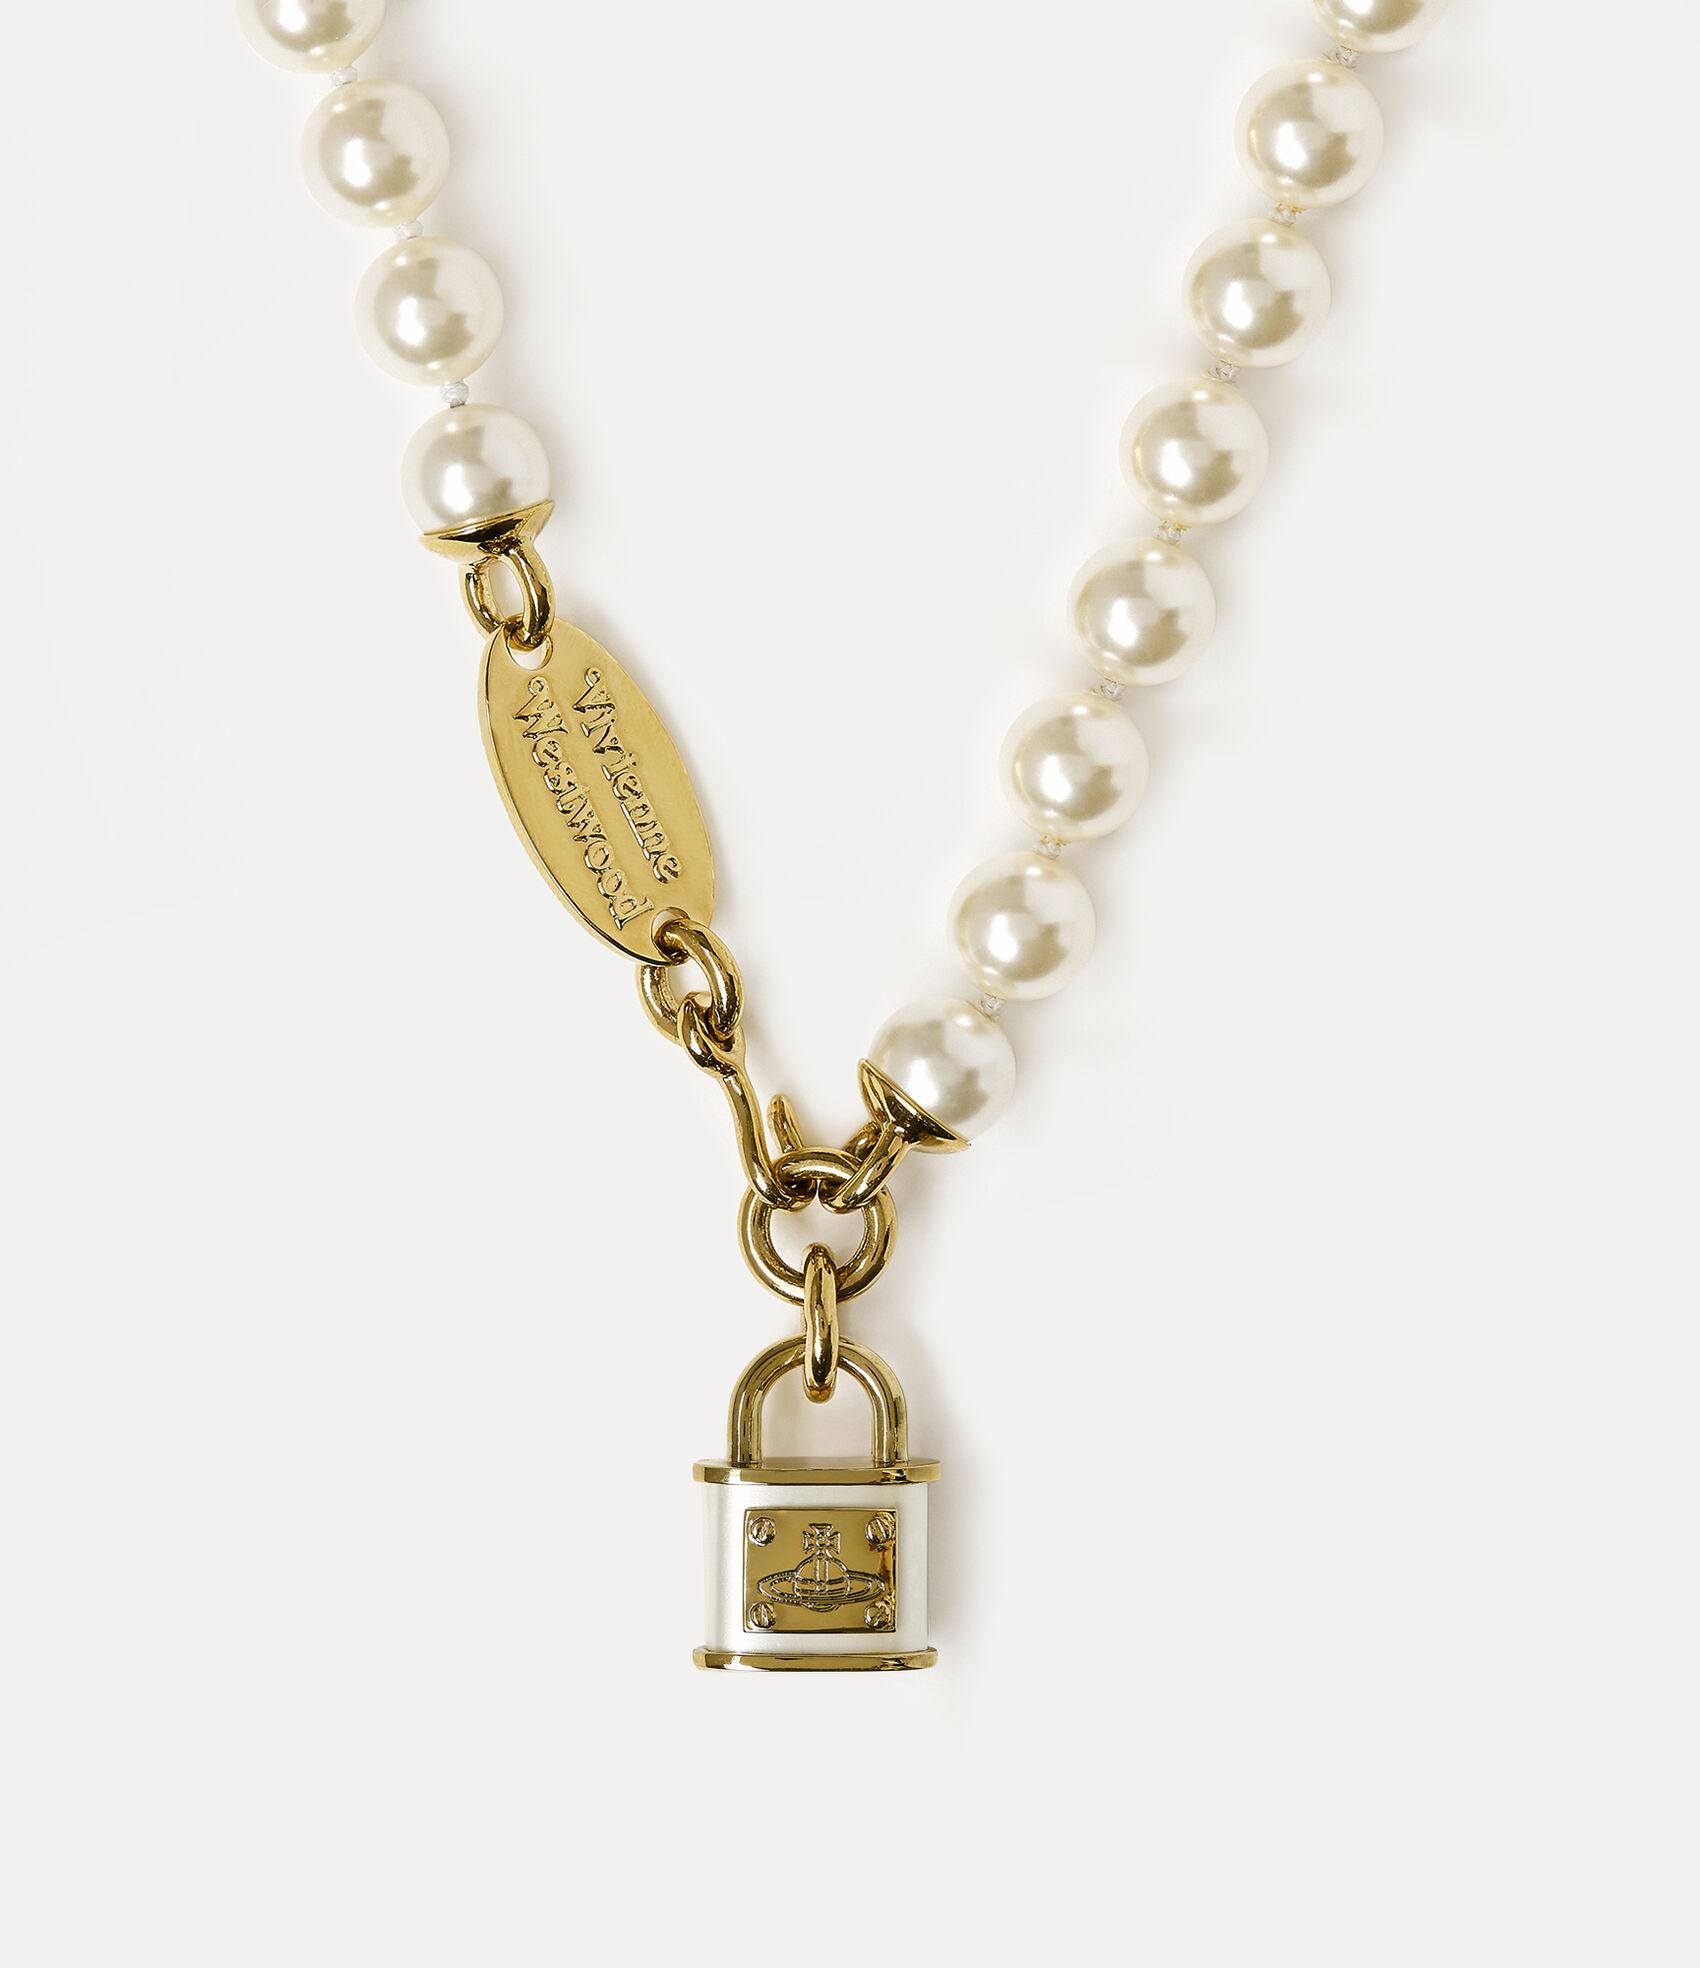 Luna Necklace Gold Tone  by Vivienne Westwood